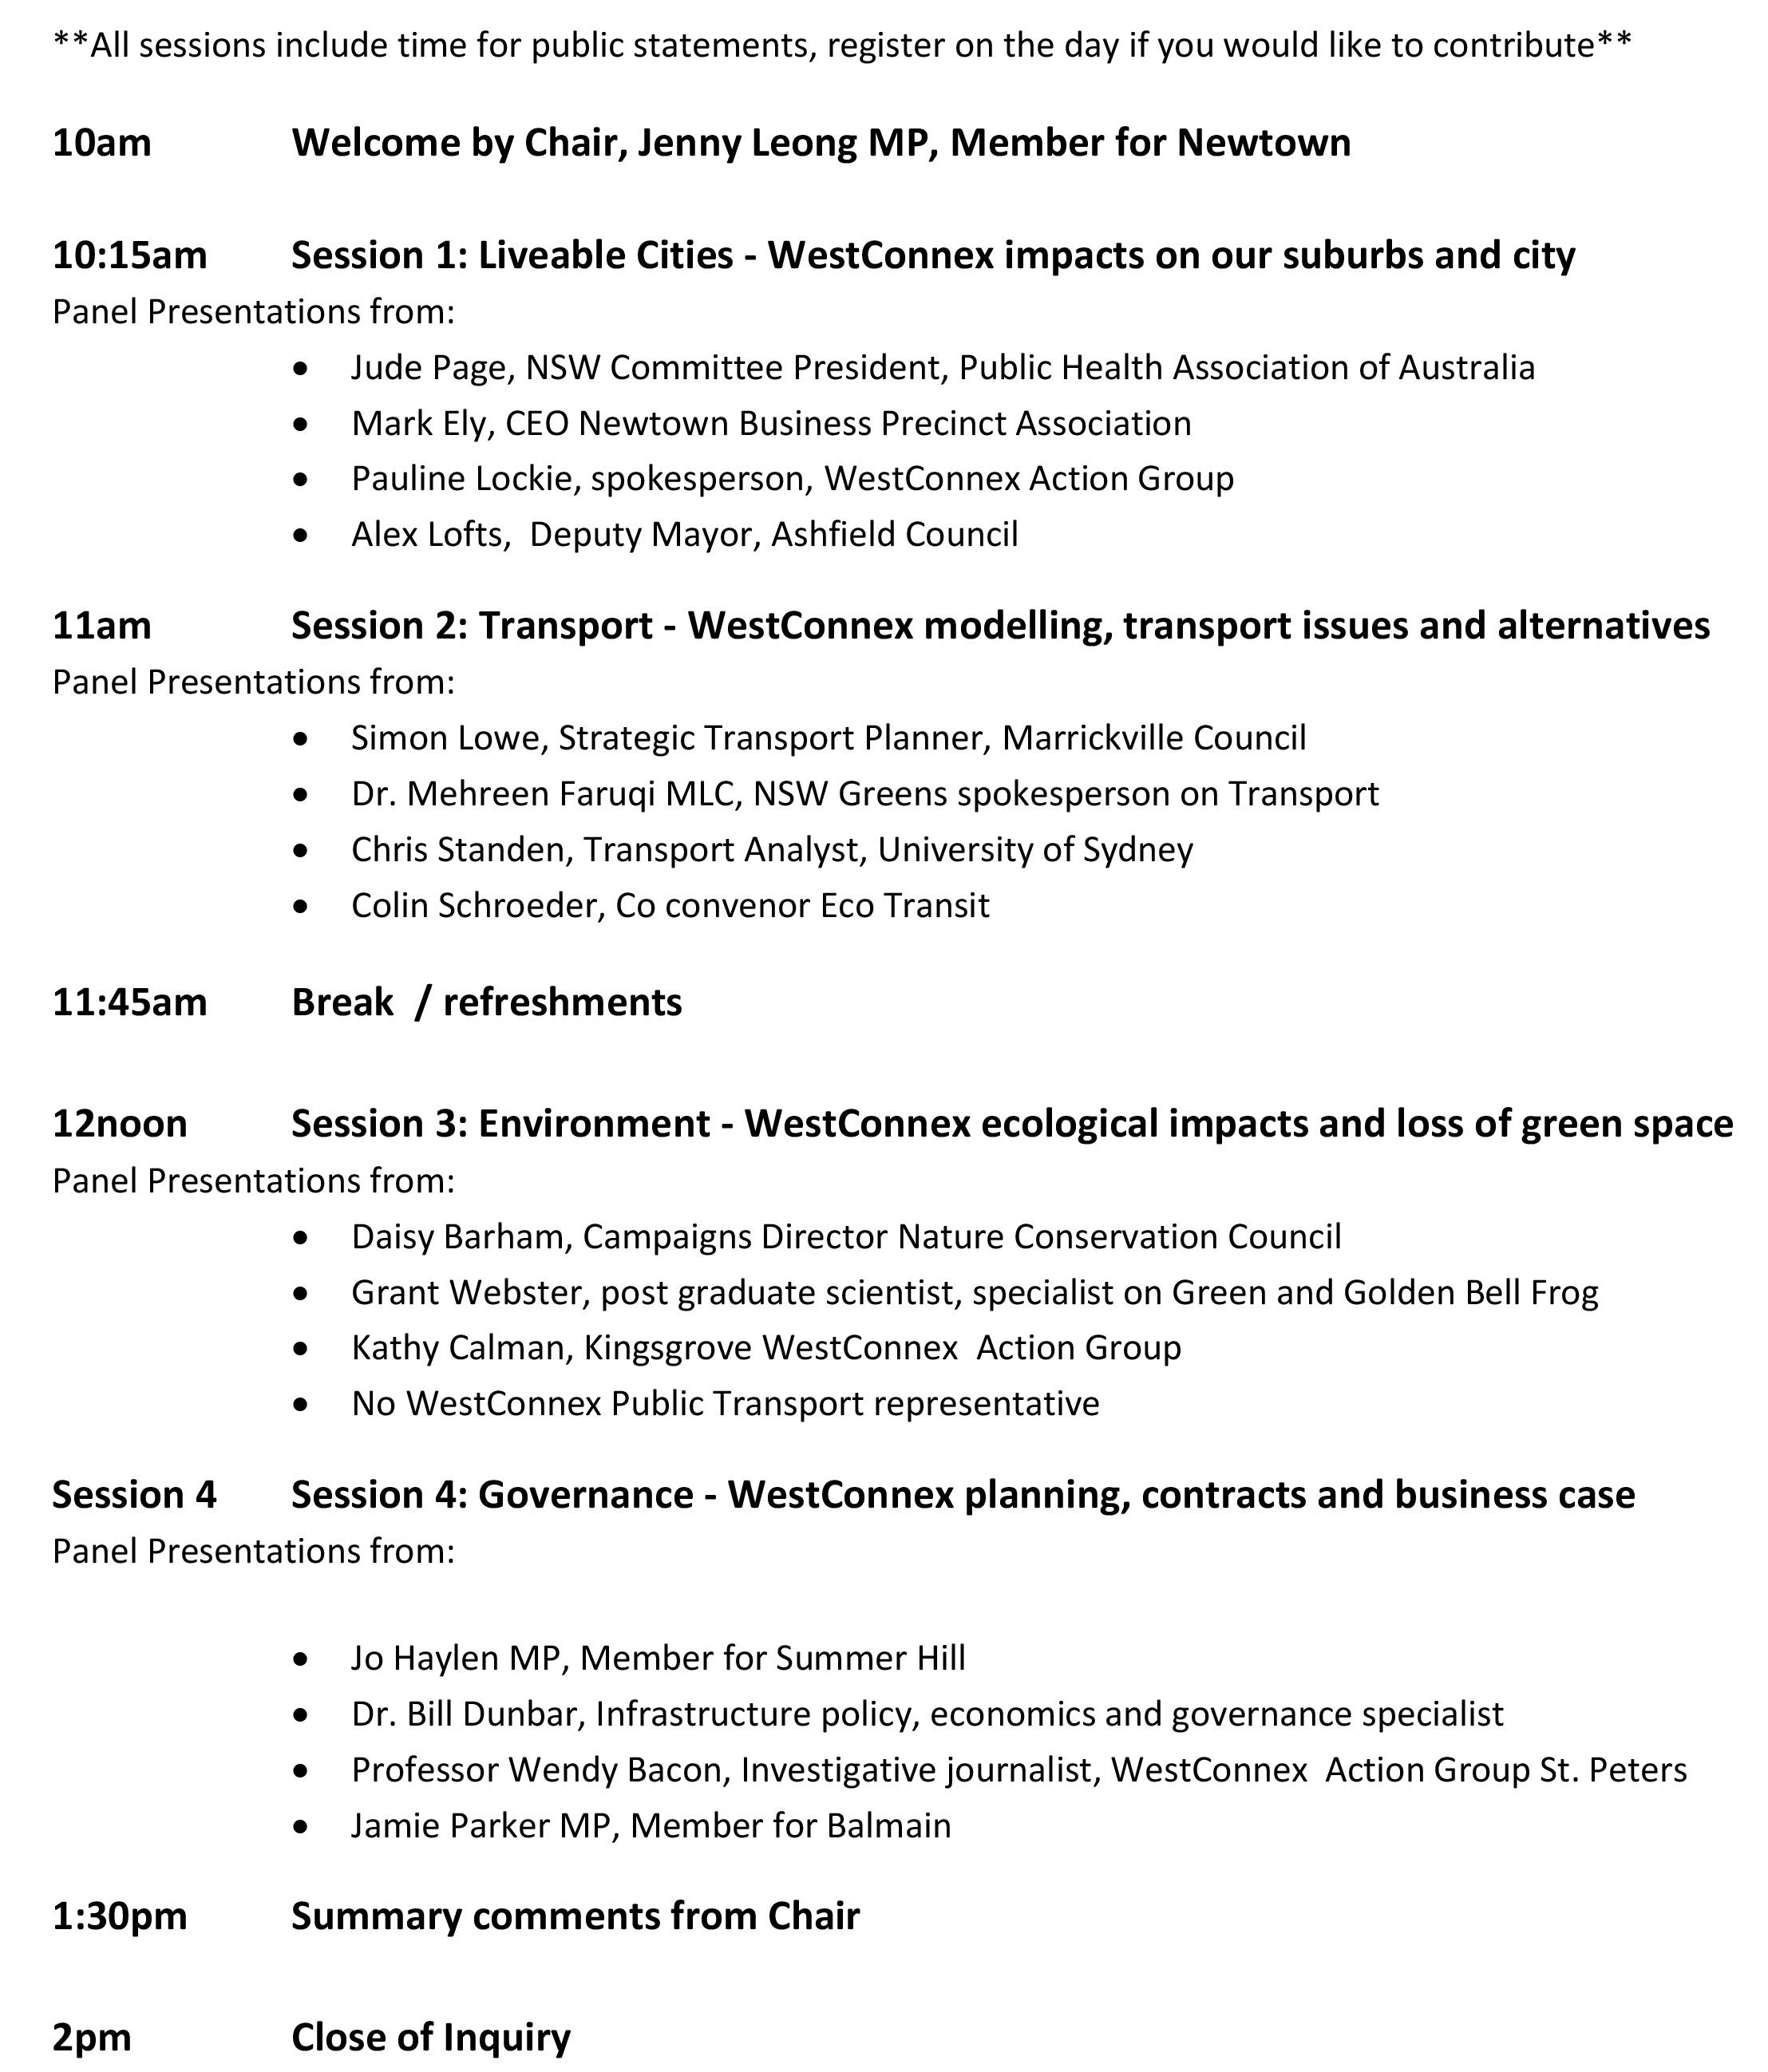 20160504_Schedule_for_Web.jpg